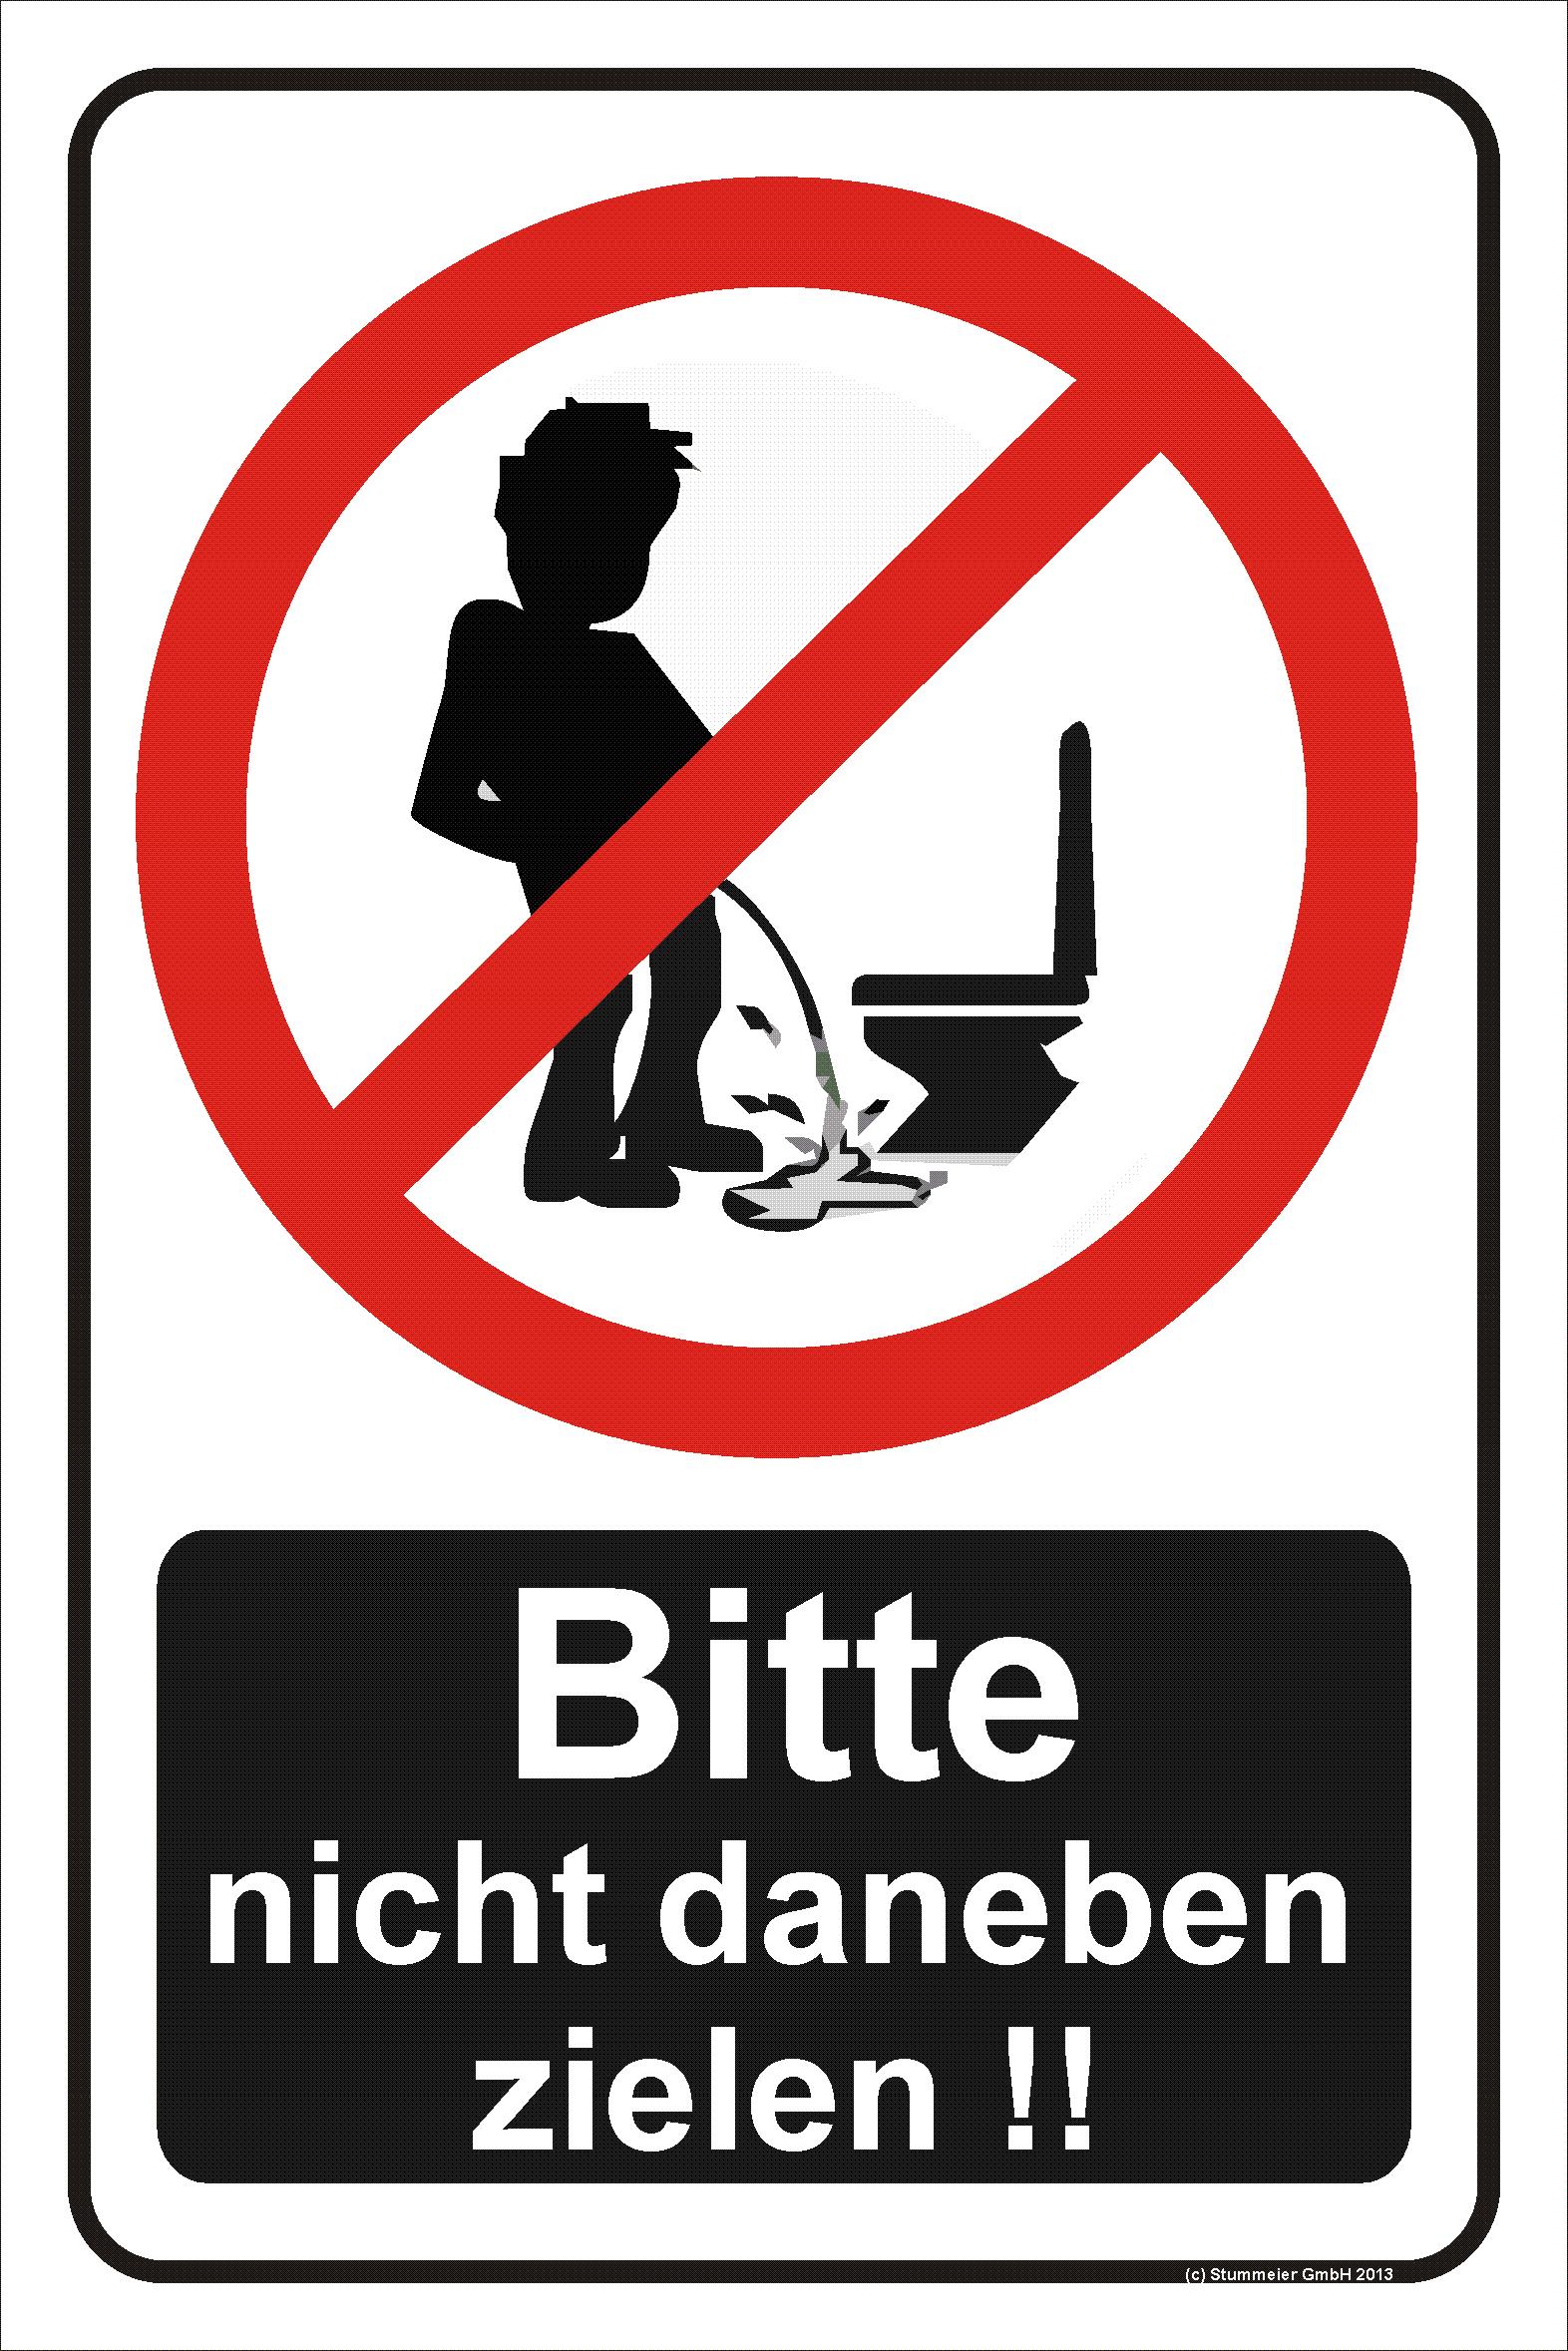 hinweisschild toilette nicht daneben zielen